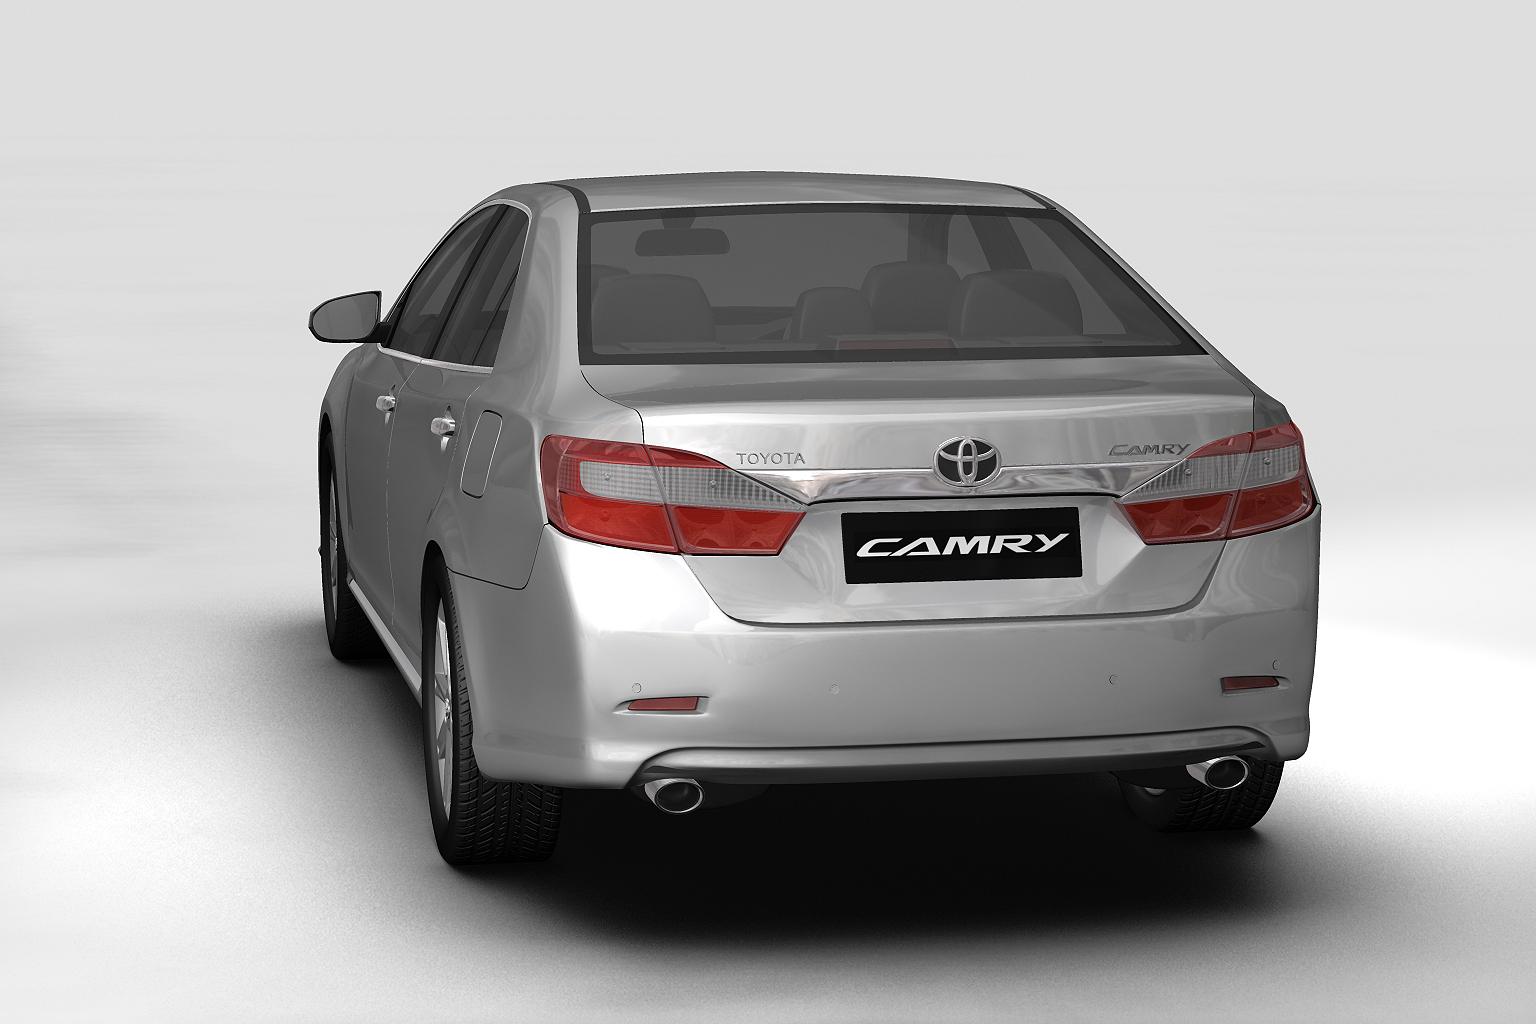 2012 toyota camry (asiya) 3d model 3ds max fbx c4d lwo hrc xsi obj 136200